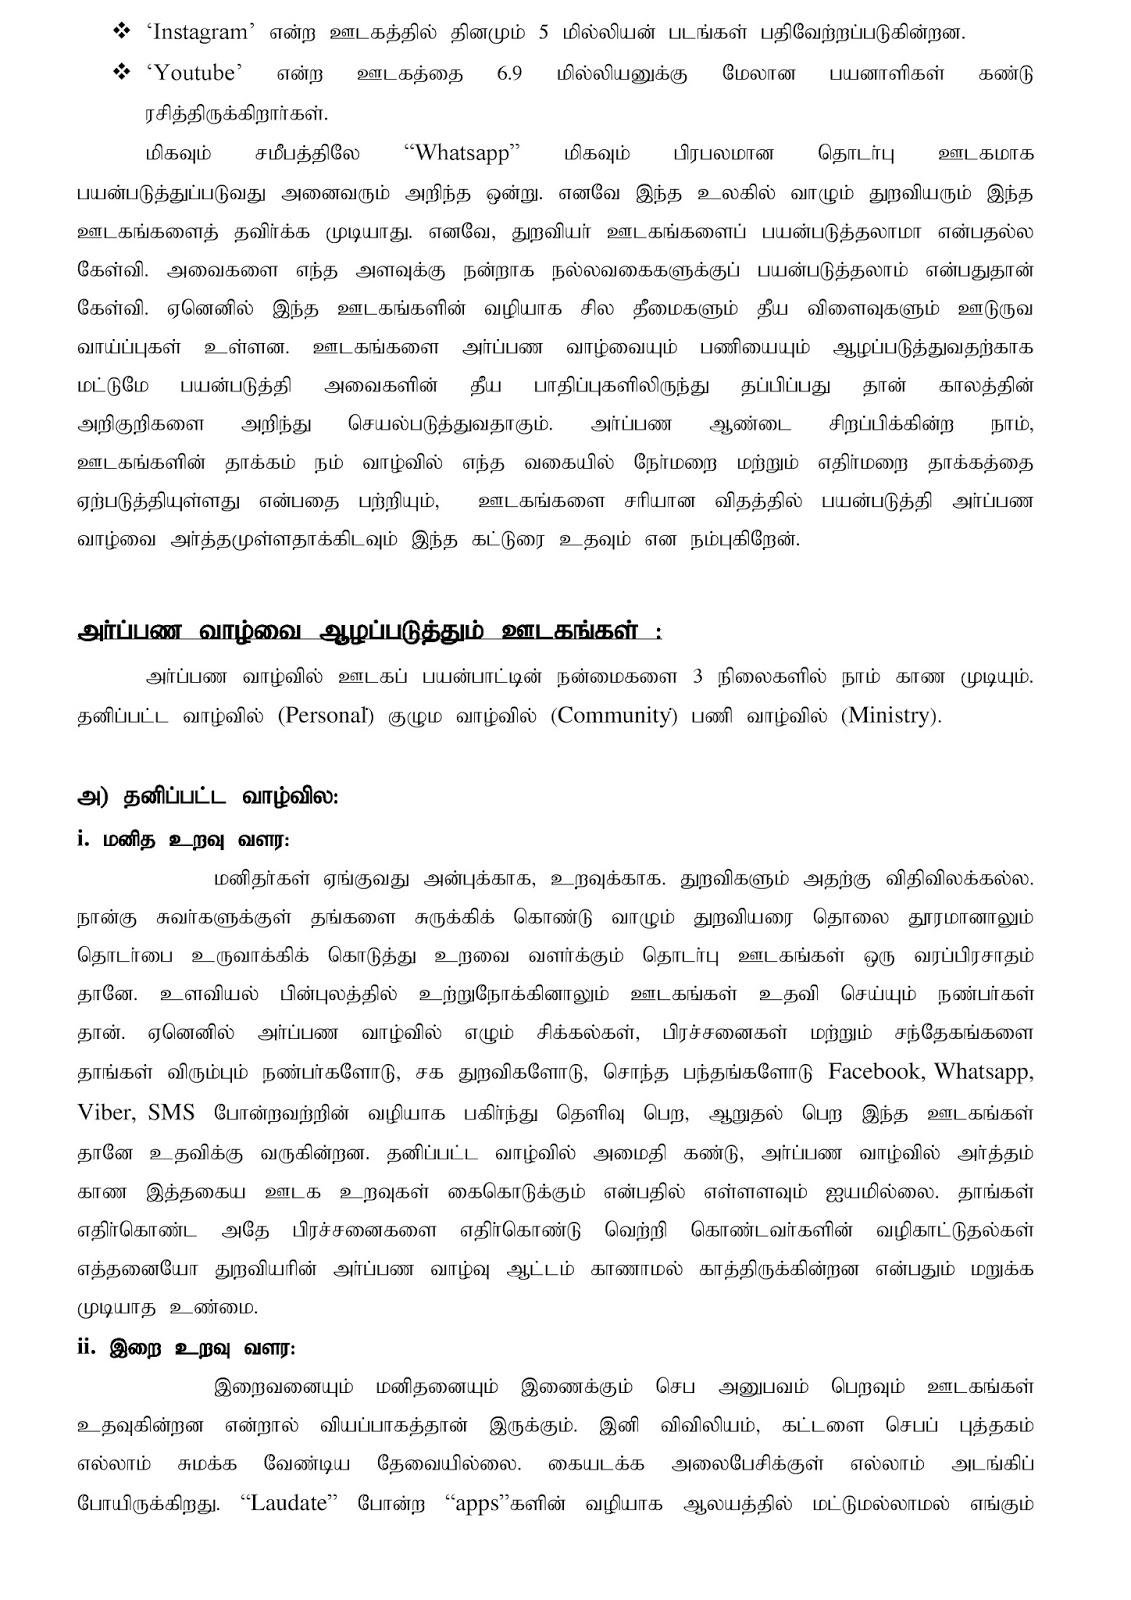 oozhal tamil katturai Dictionary, english & tamil - 1858 william nevins அகராதி மேலும்.